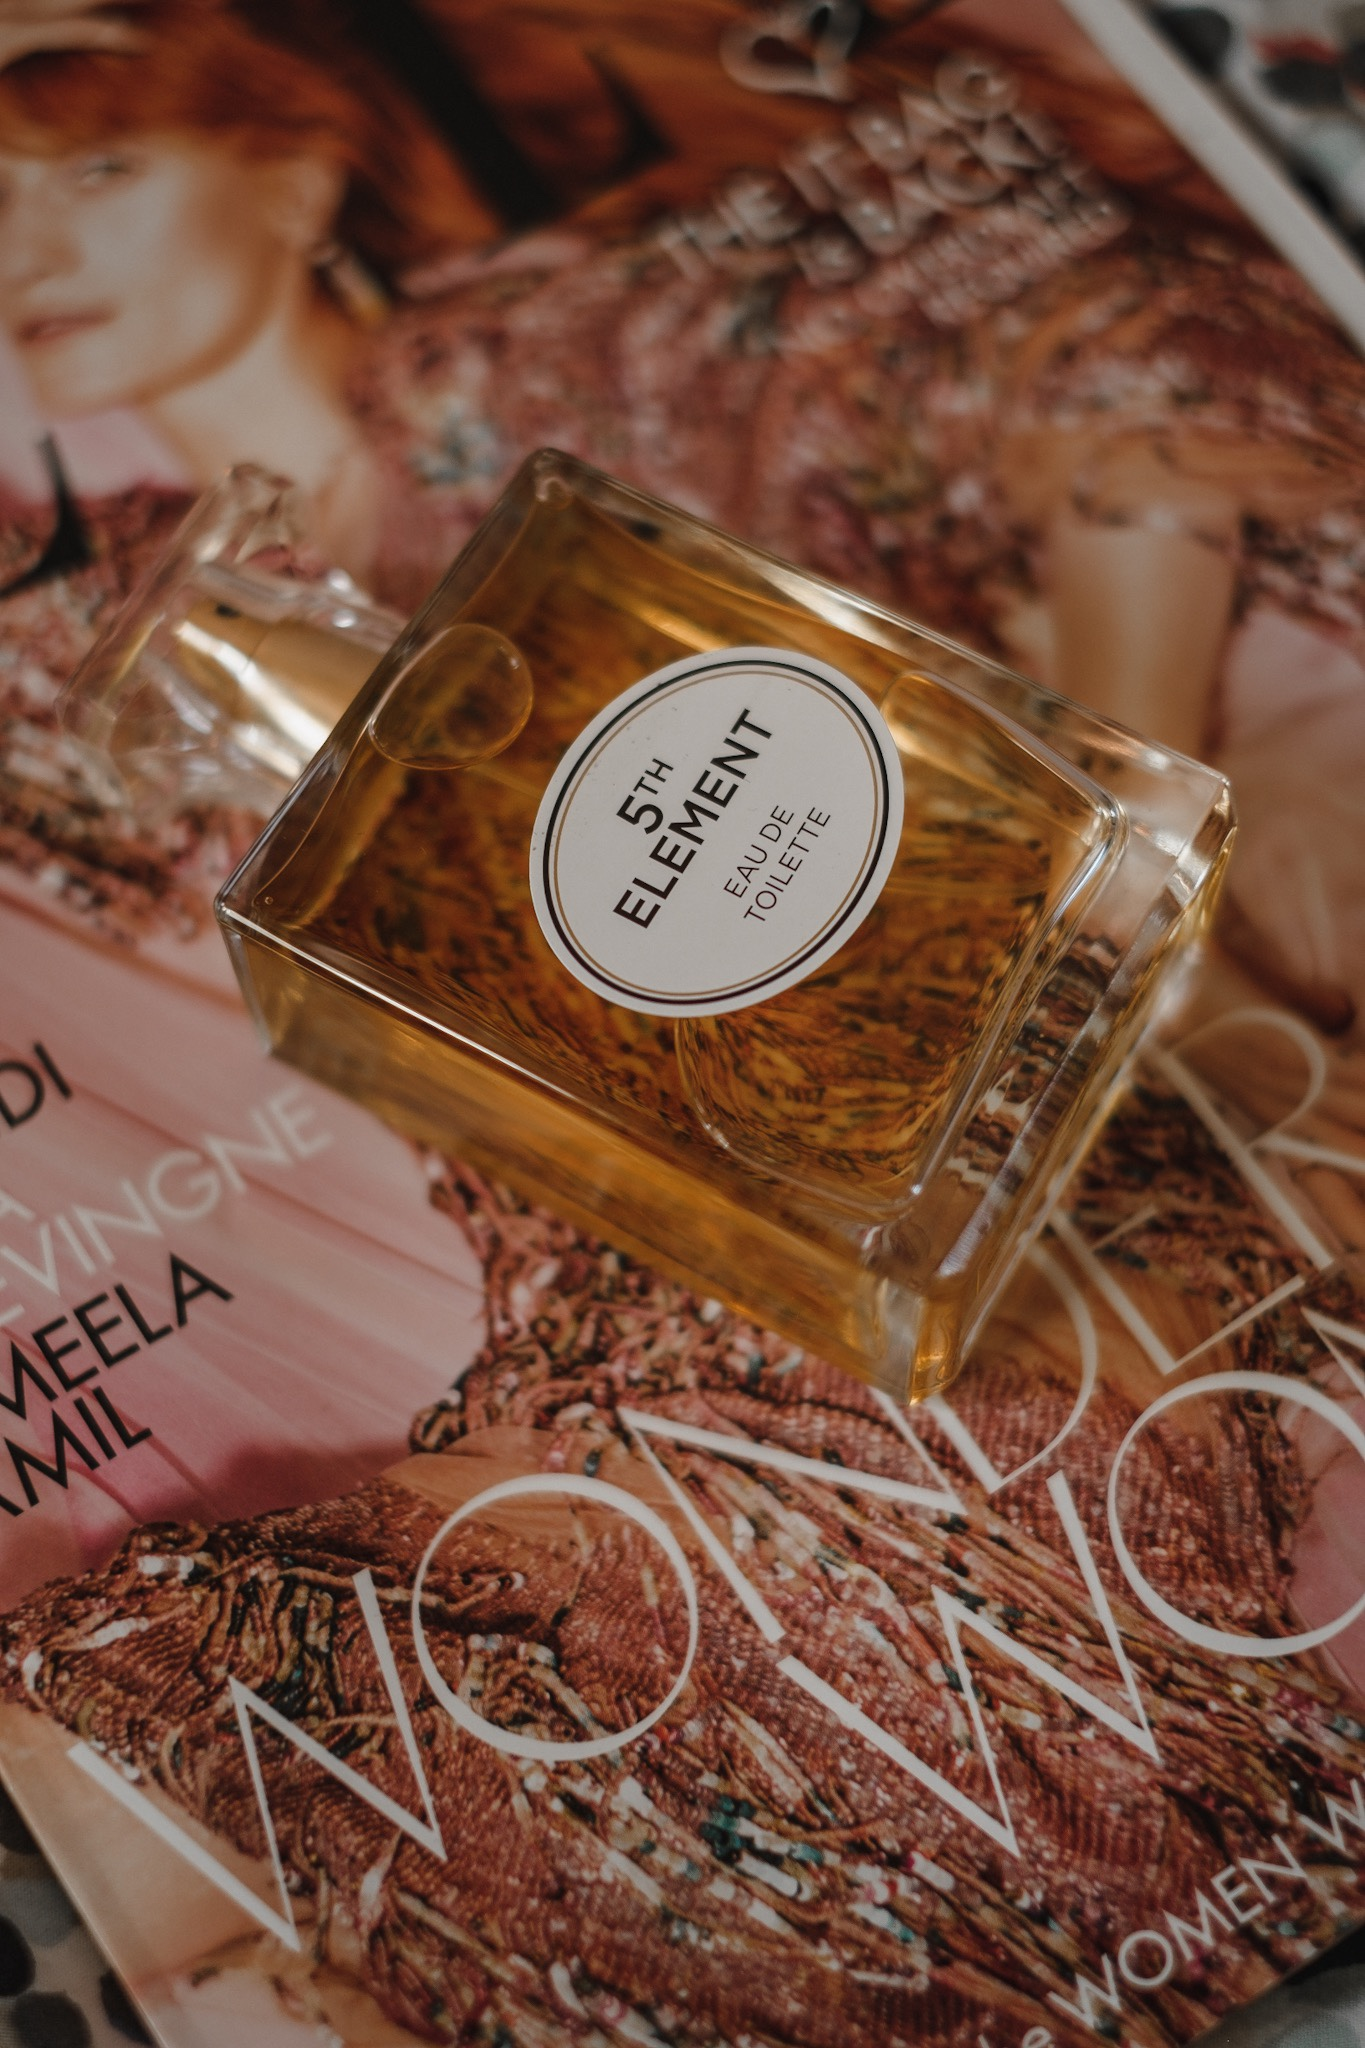 Lacura, Aldi, Perfume, Chanel No.5 Dupe, Flatlay, Derbyshire Bloggers, Derby Bloggers, Katie Writes,